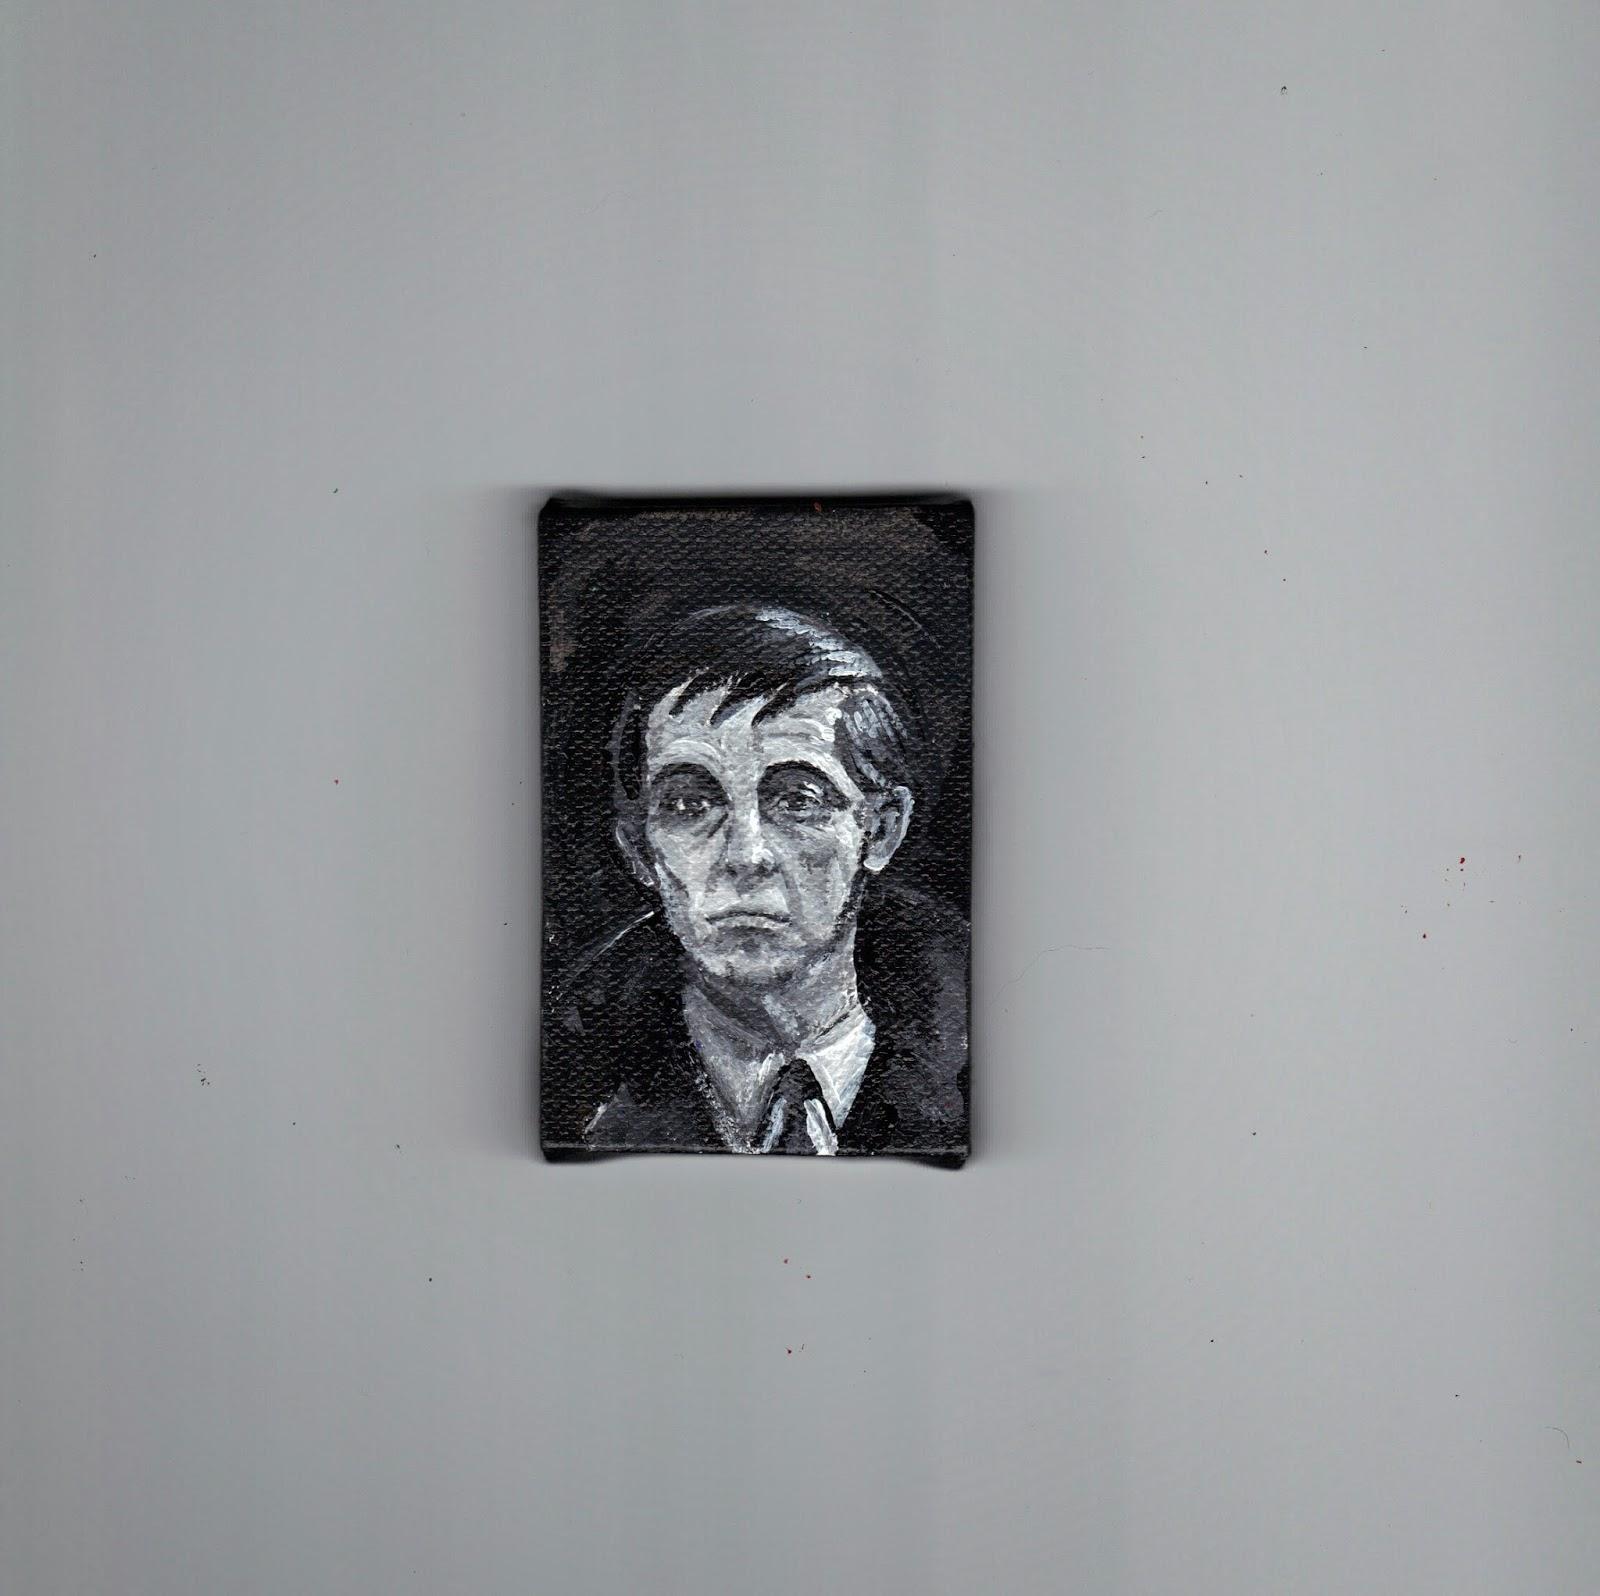 https://www.etsy.com/listing/173126599/miniature-painting-original-art-barnabas?ref=listing-shop-header-3